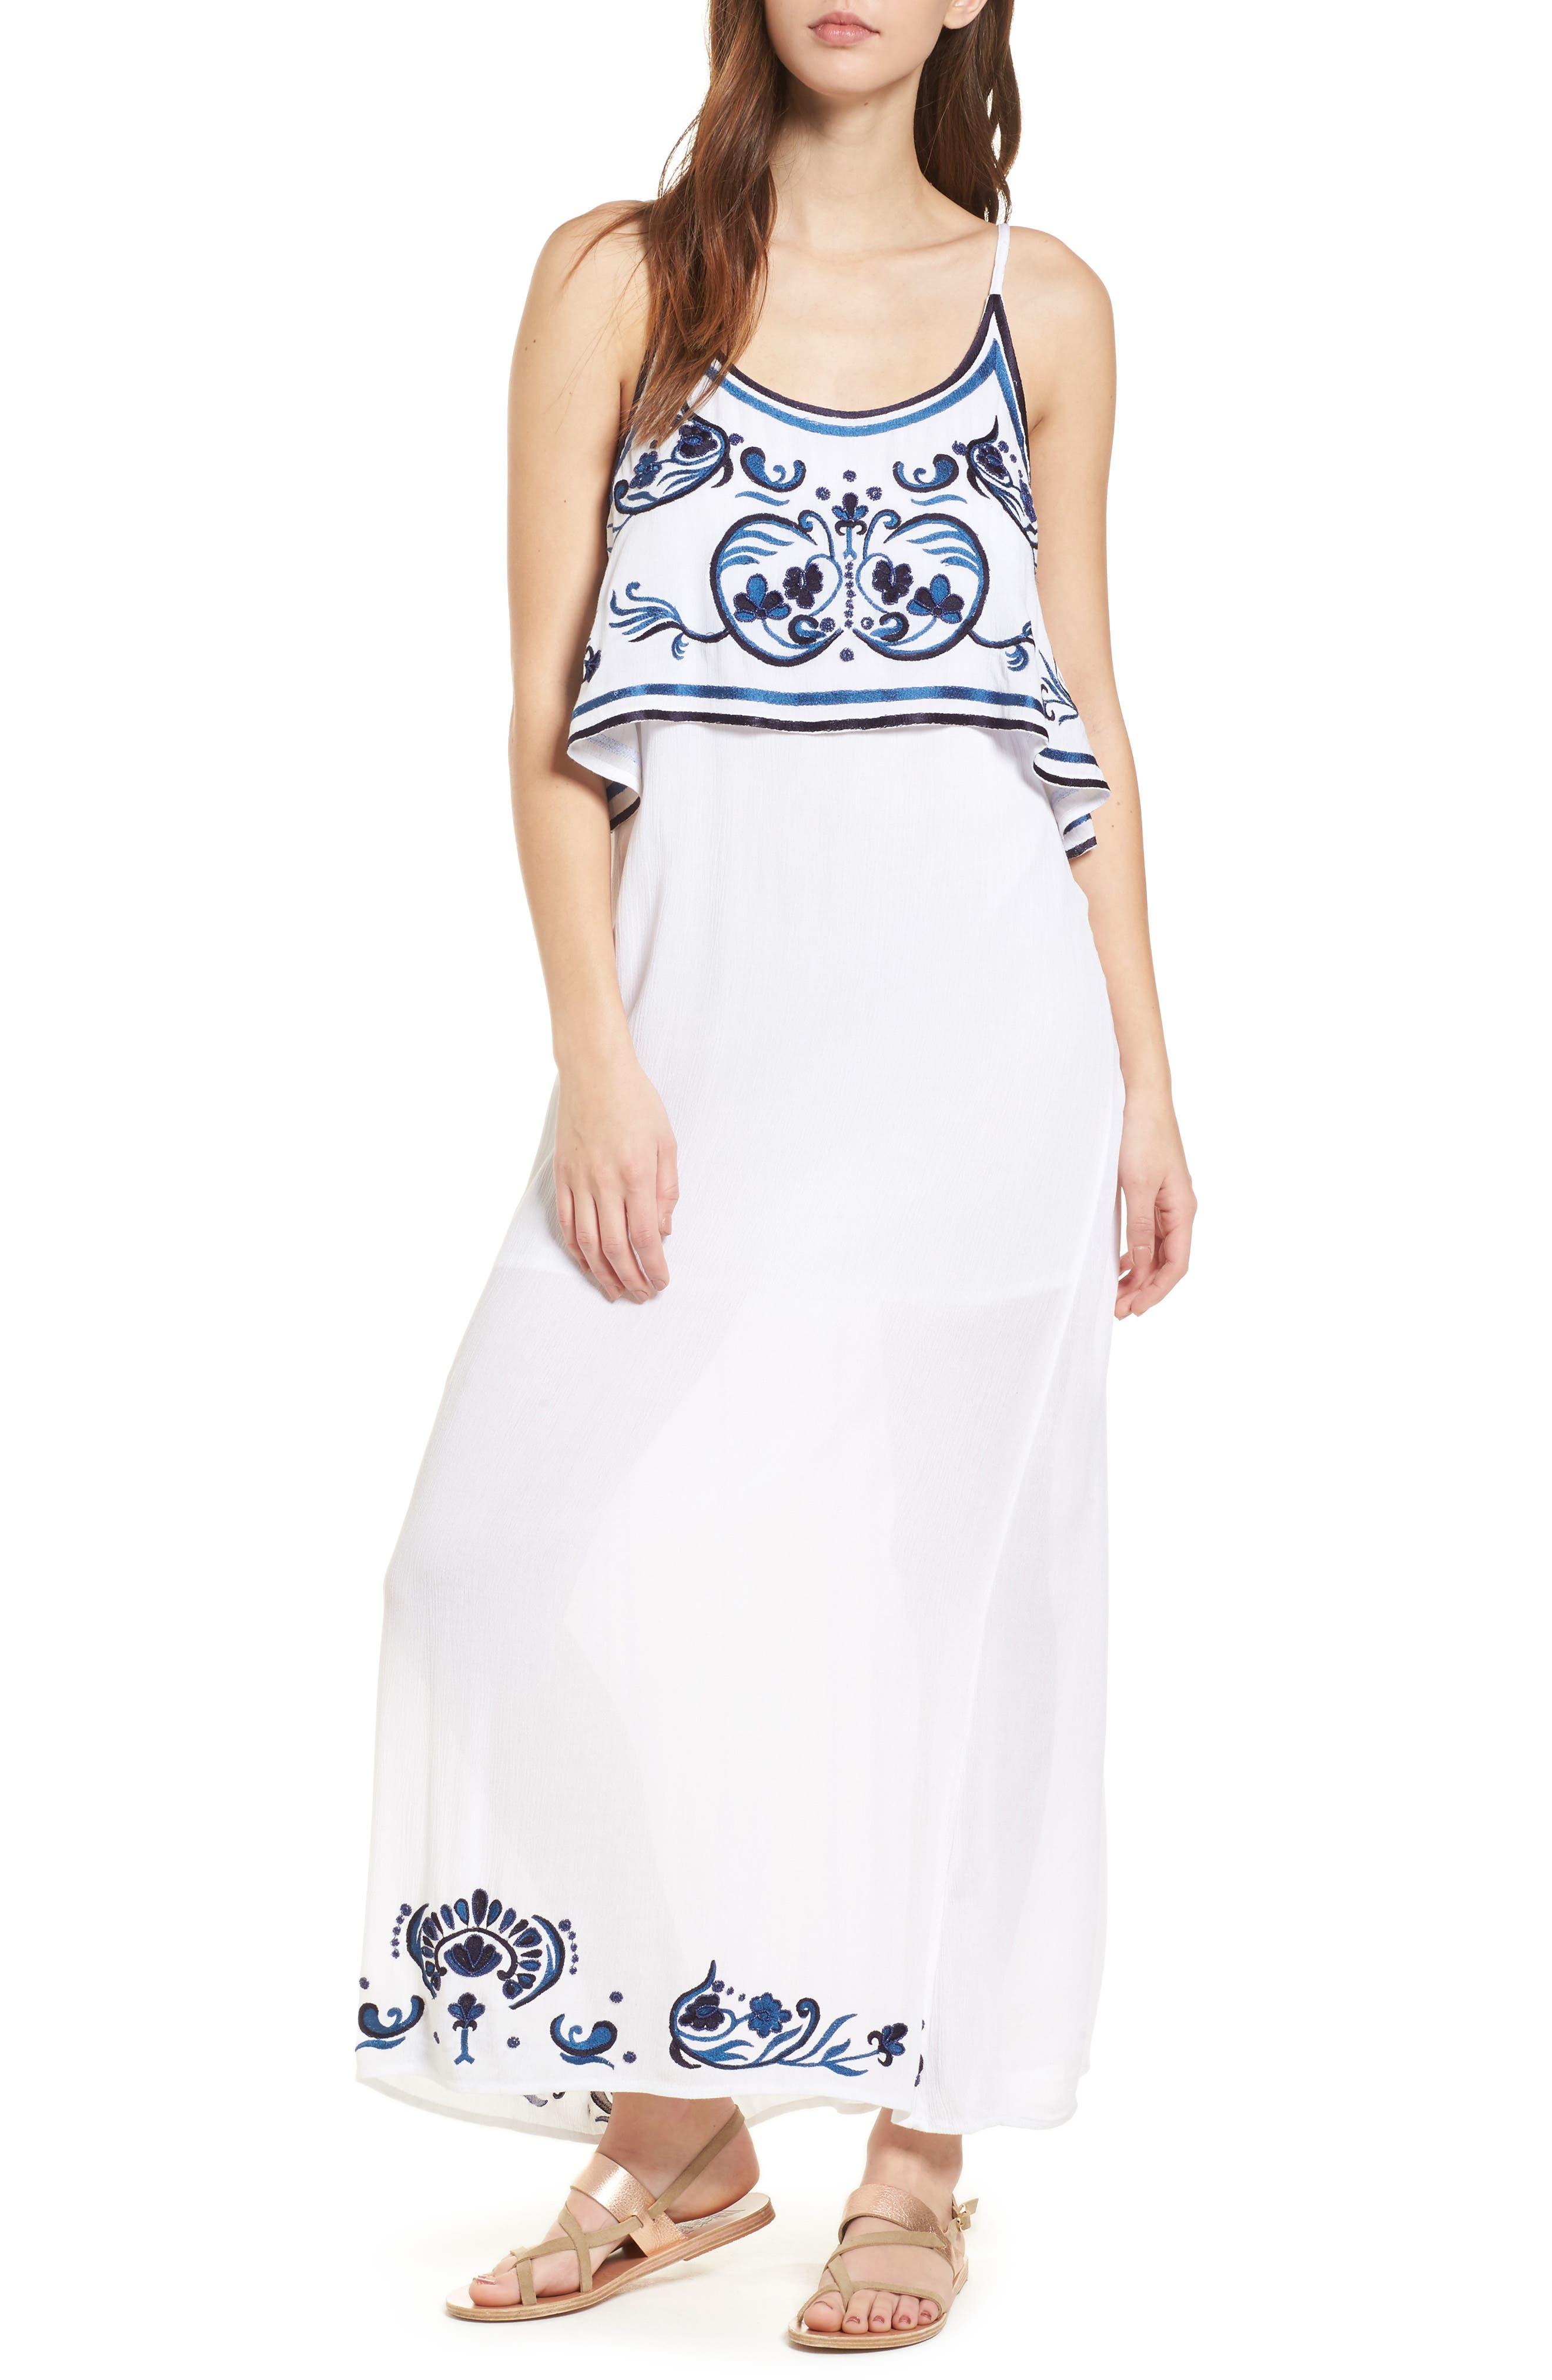 Raga Mediterranean Embroidered Maxi Dress